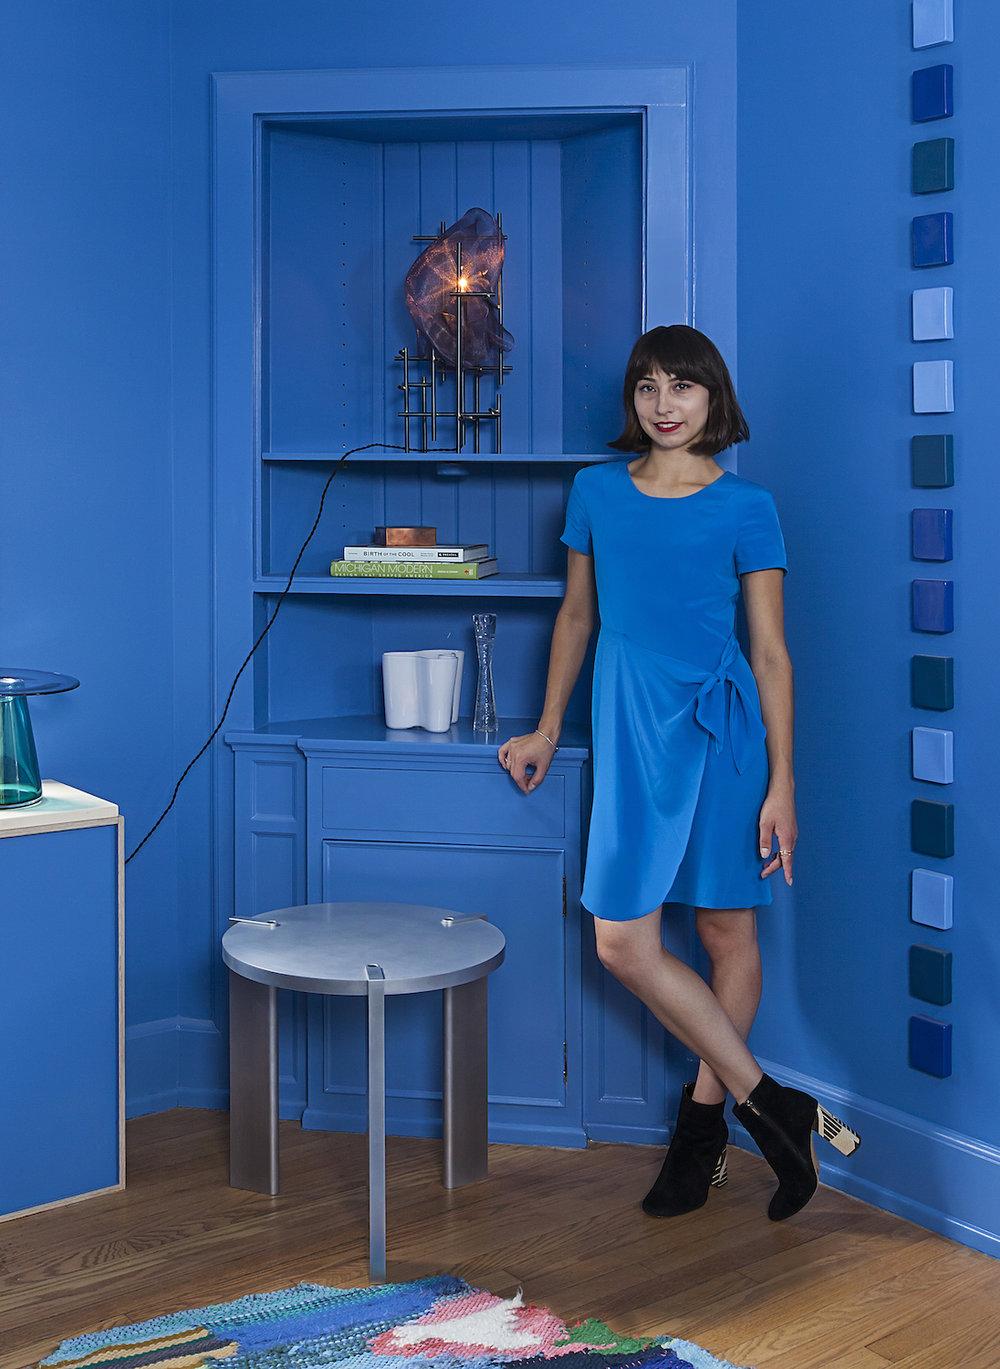 iweiss in blue room small.jpeg